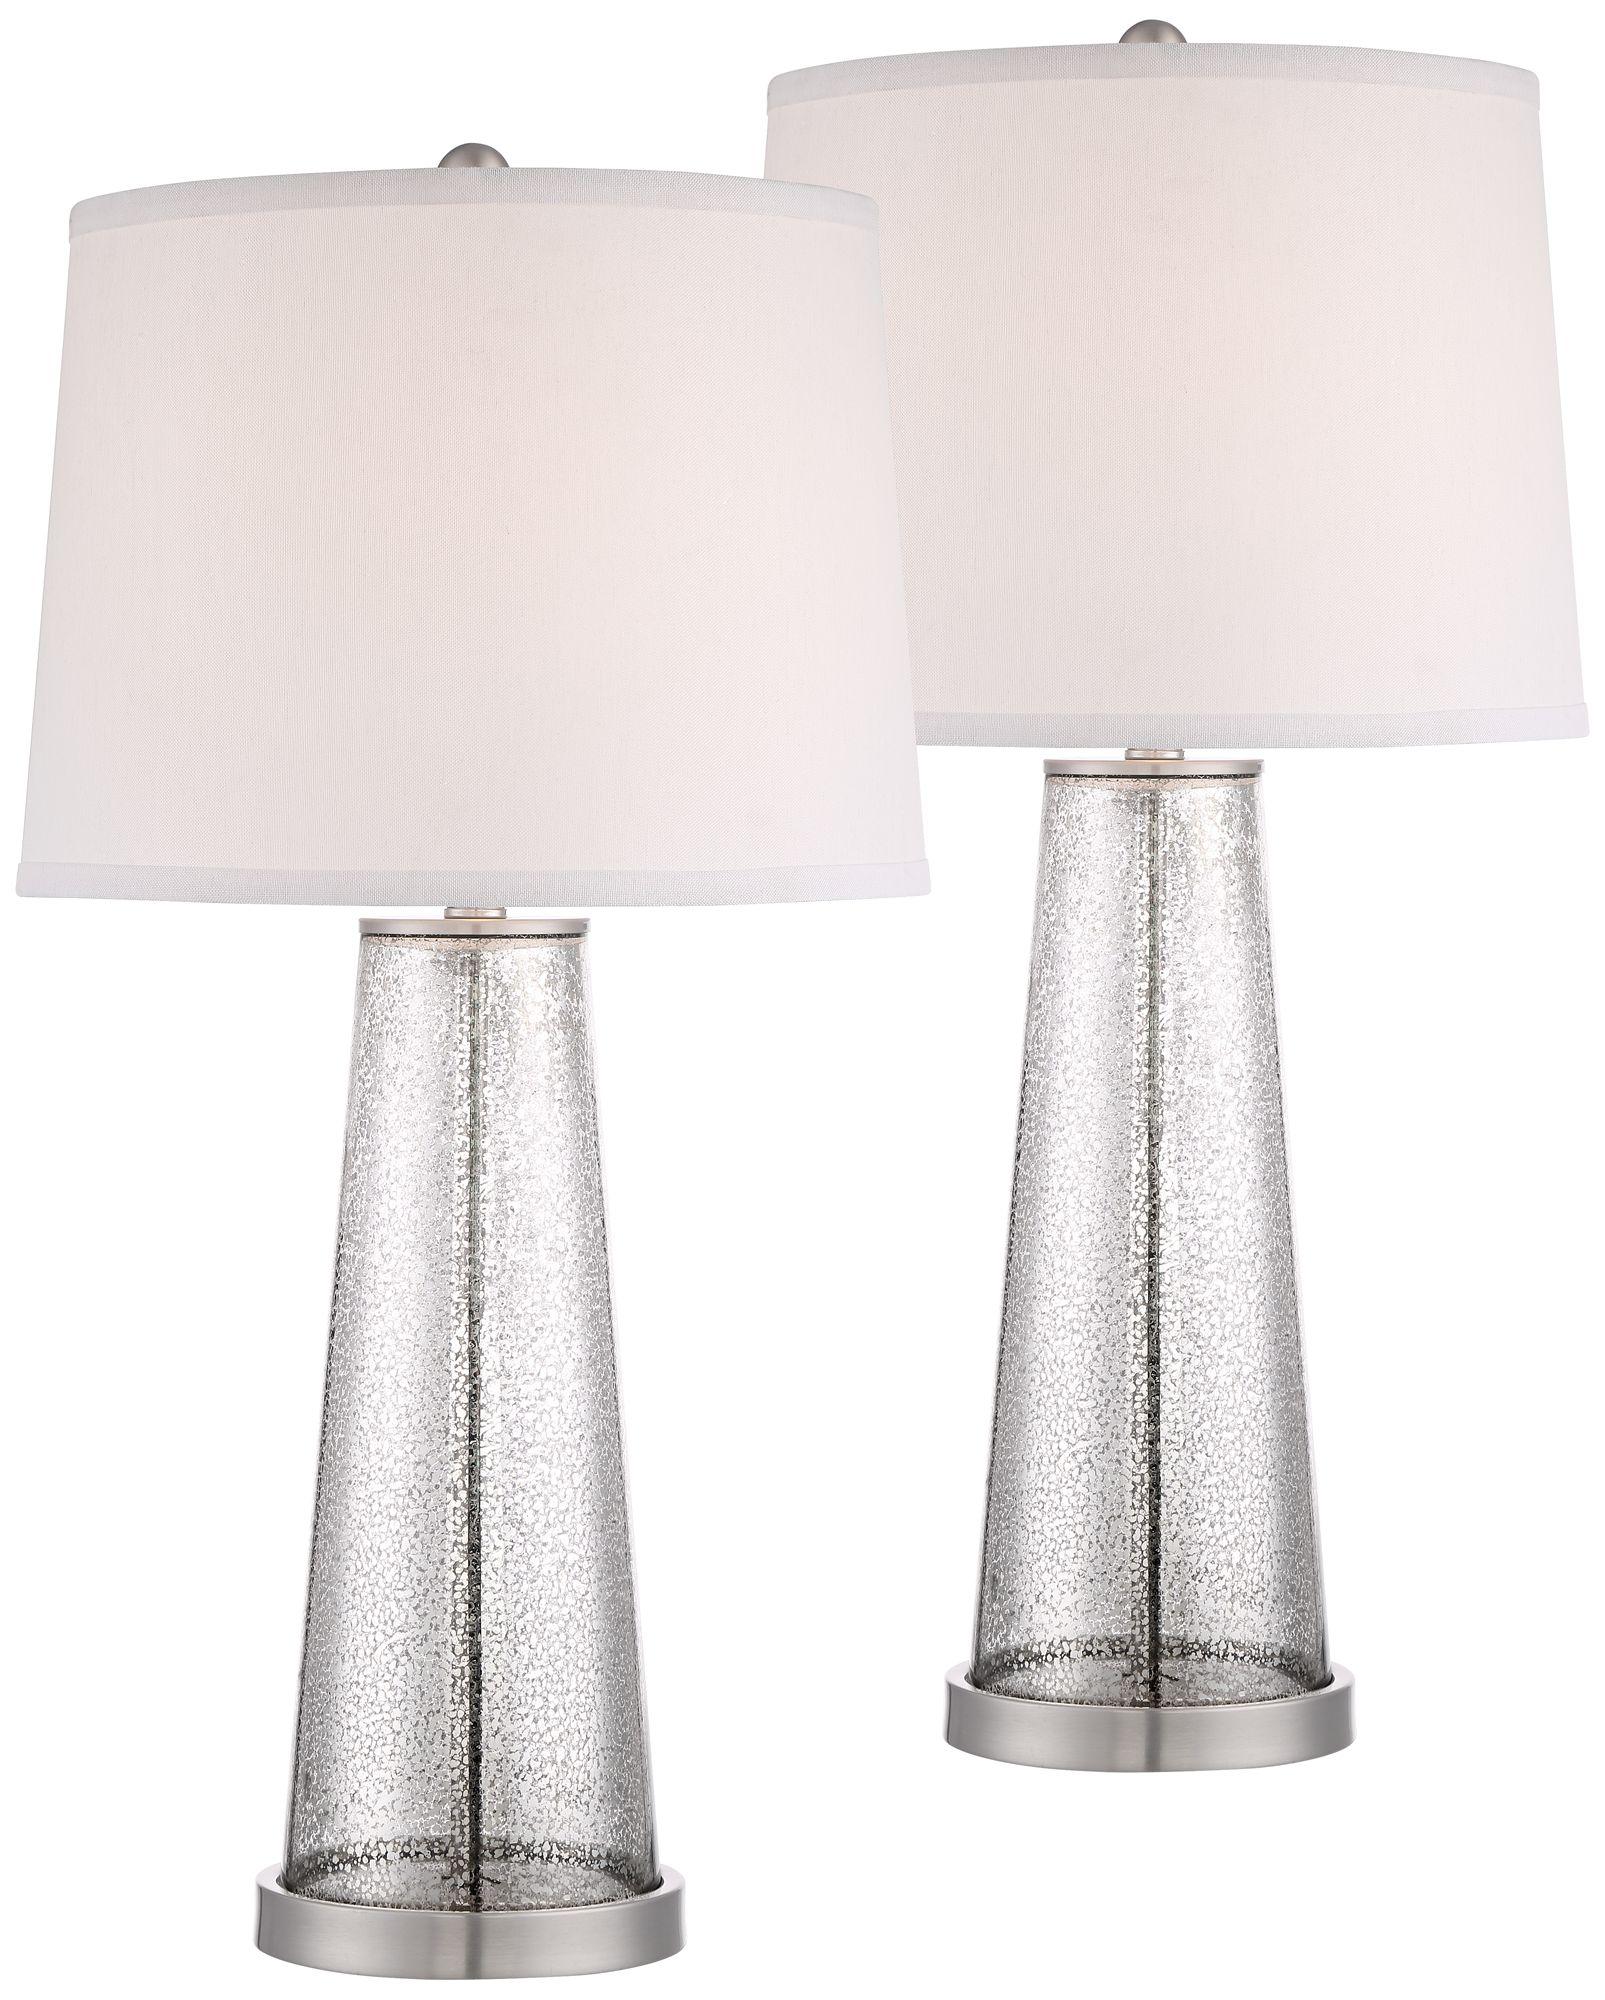 andrea mercury glass table lamp set of 2 - Mercury Glass Lamps